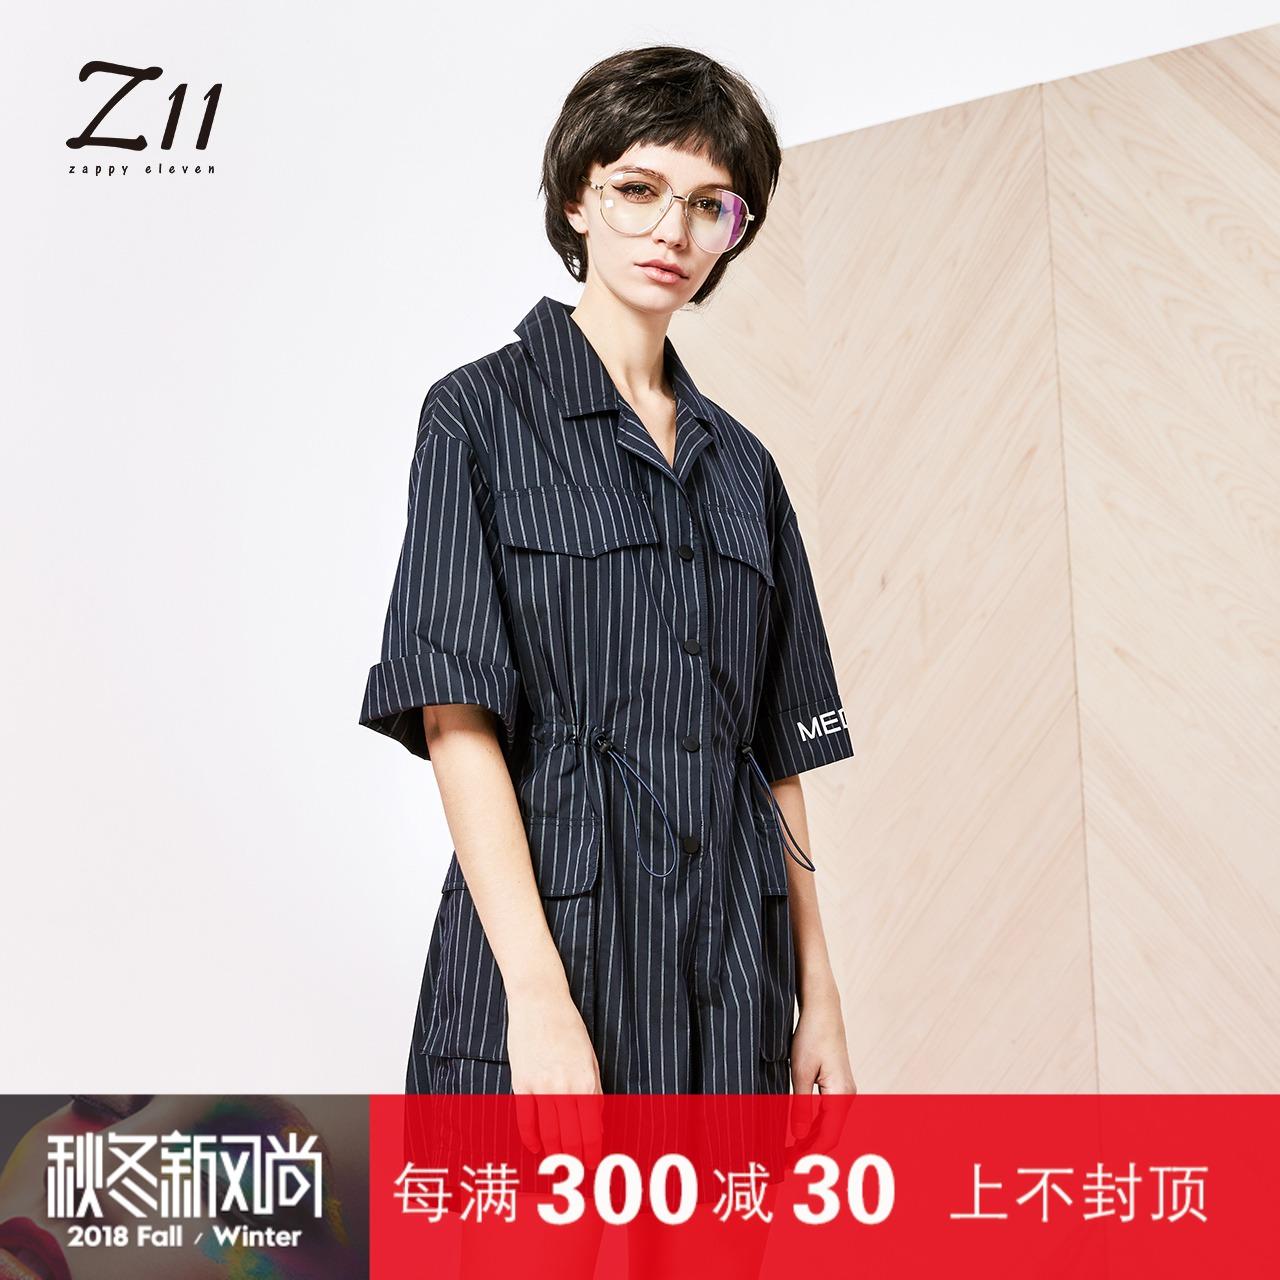 z11女装专柜正品2018秋装经典竖条纹五分袖连体裤Z18AY538